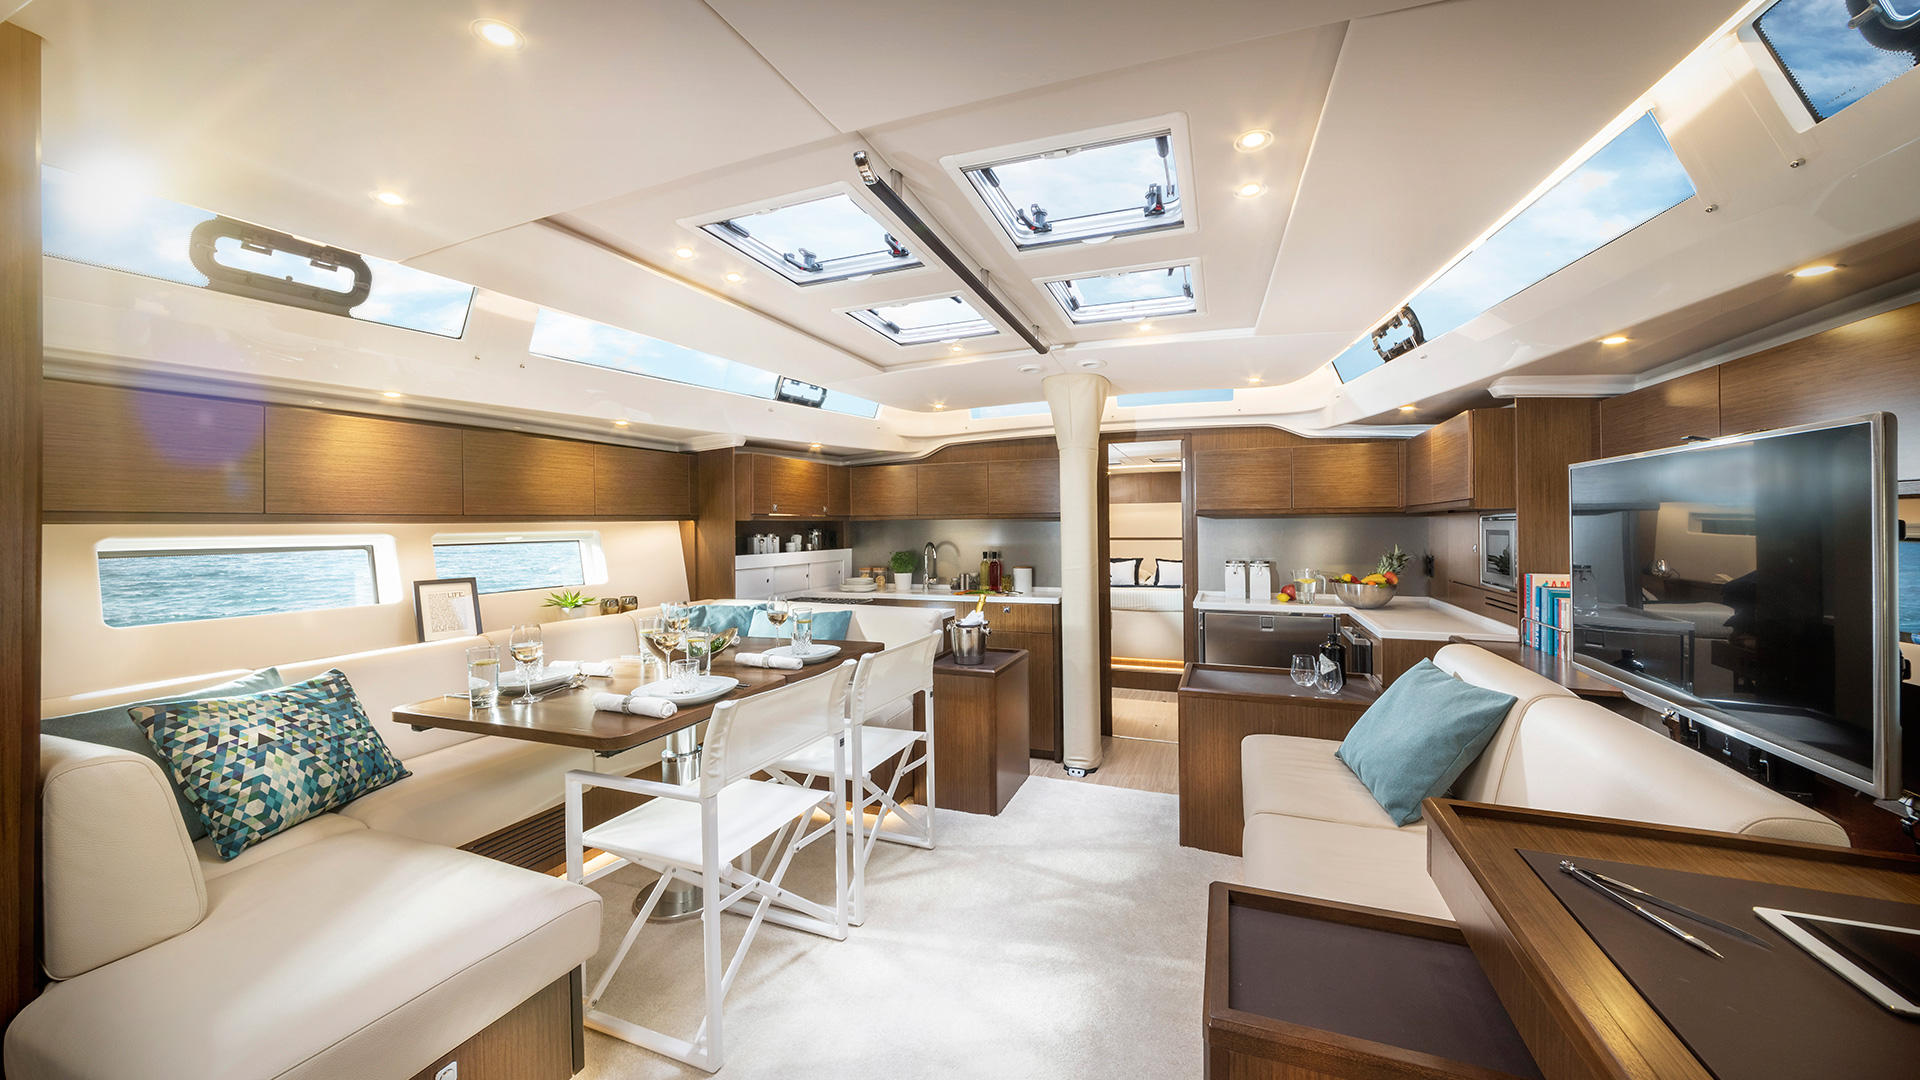 luxury sailing yacht bavaria c57 interior, bluemotion yacht charter, sailing in croatia, luxury sailing holidays